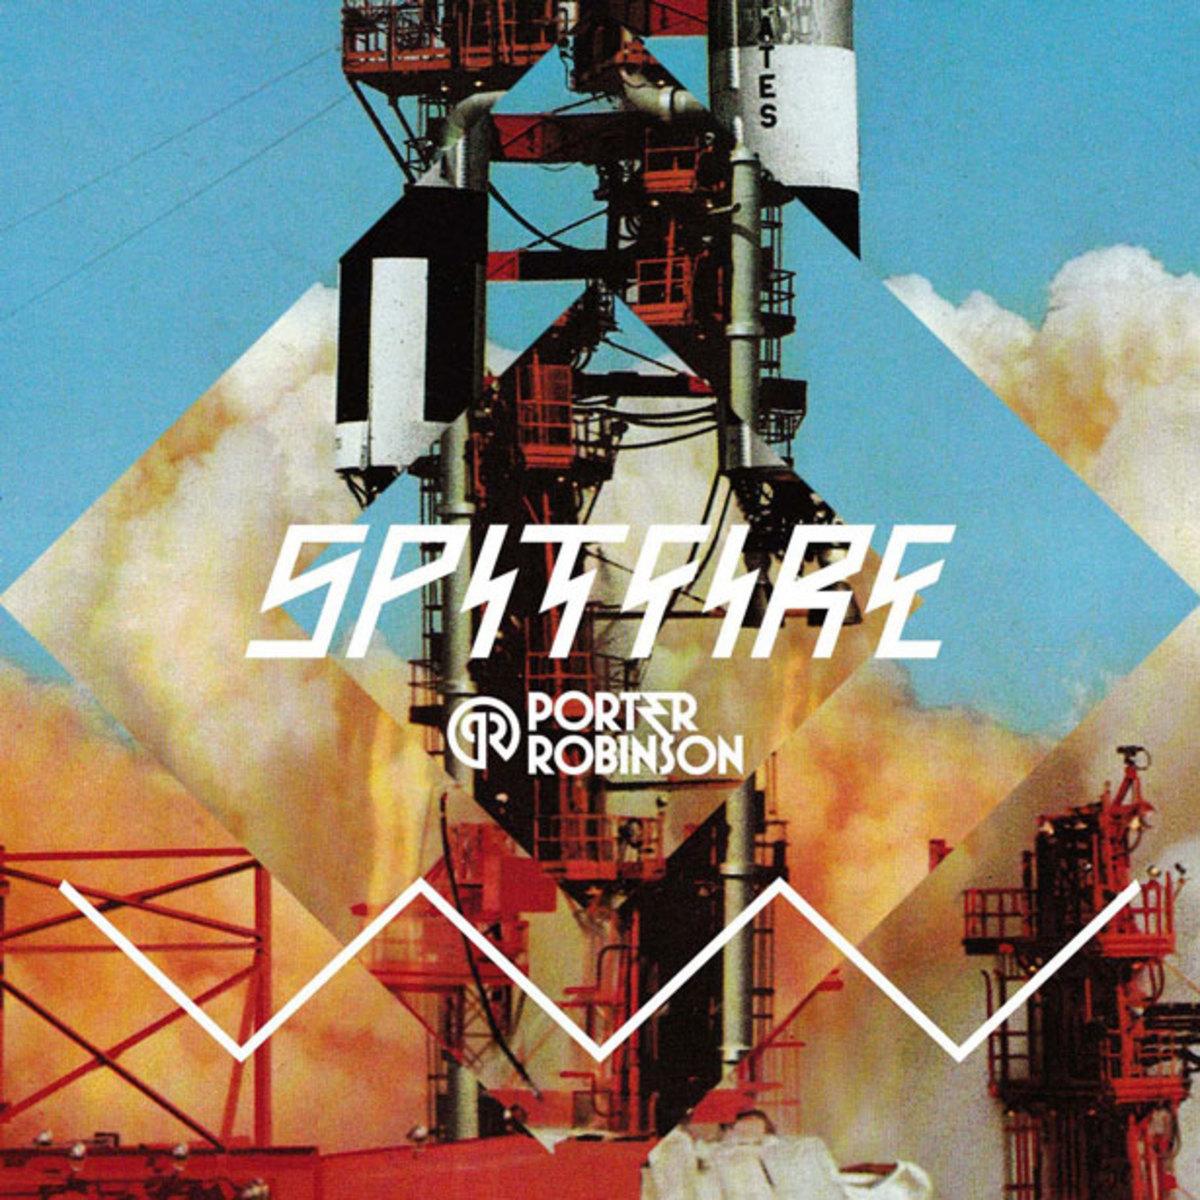 spitfire+porter+robinson